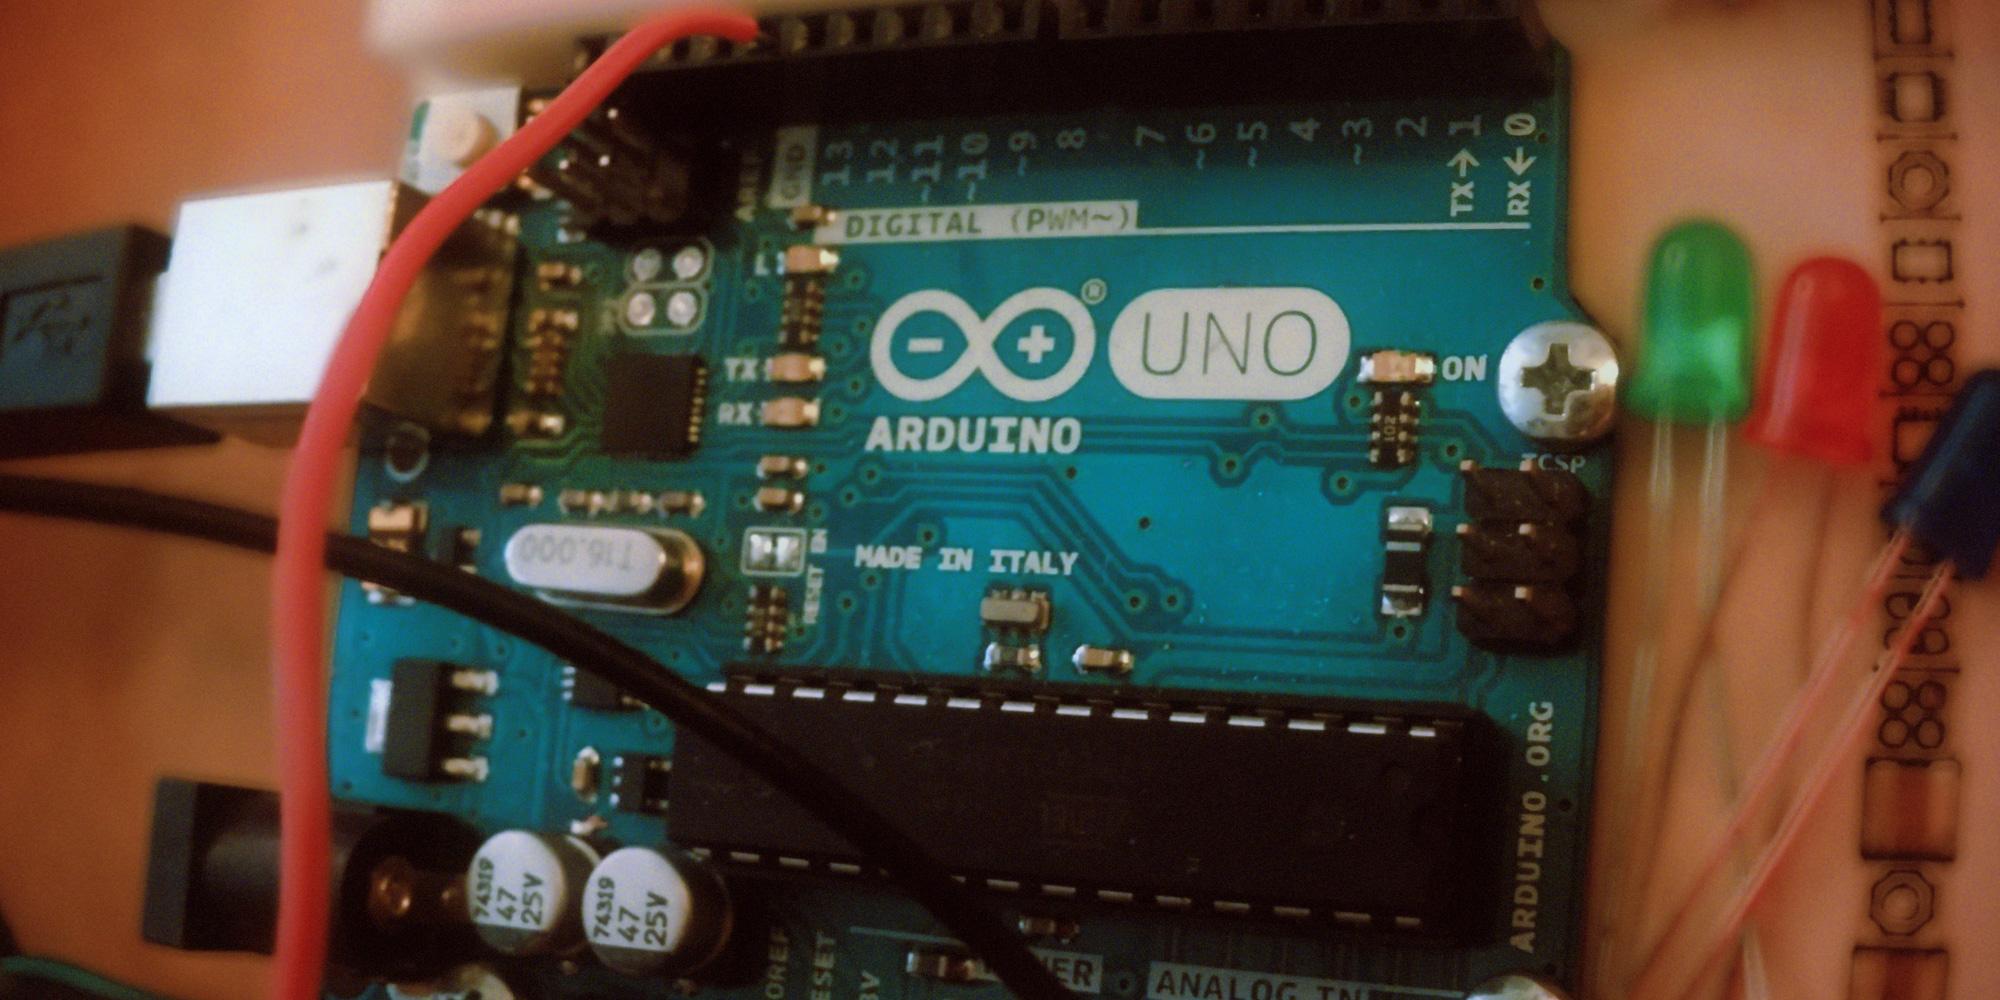 http://www.friendsinyourhead.com/arduino/001.jpg